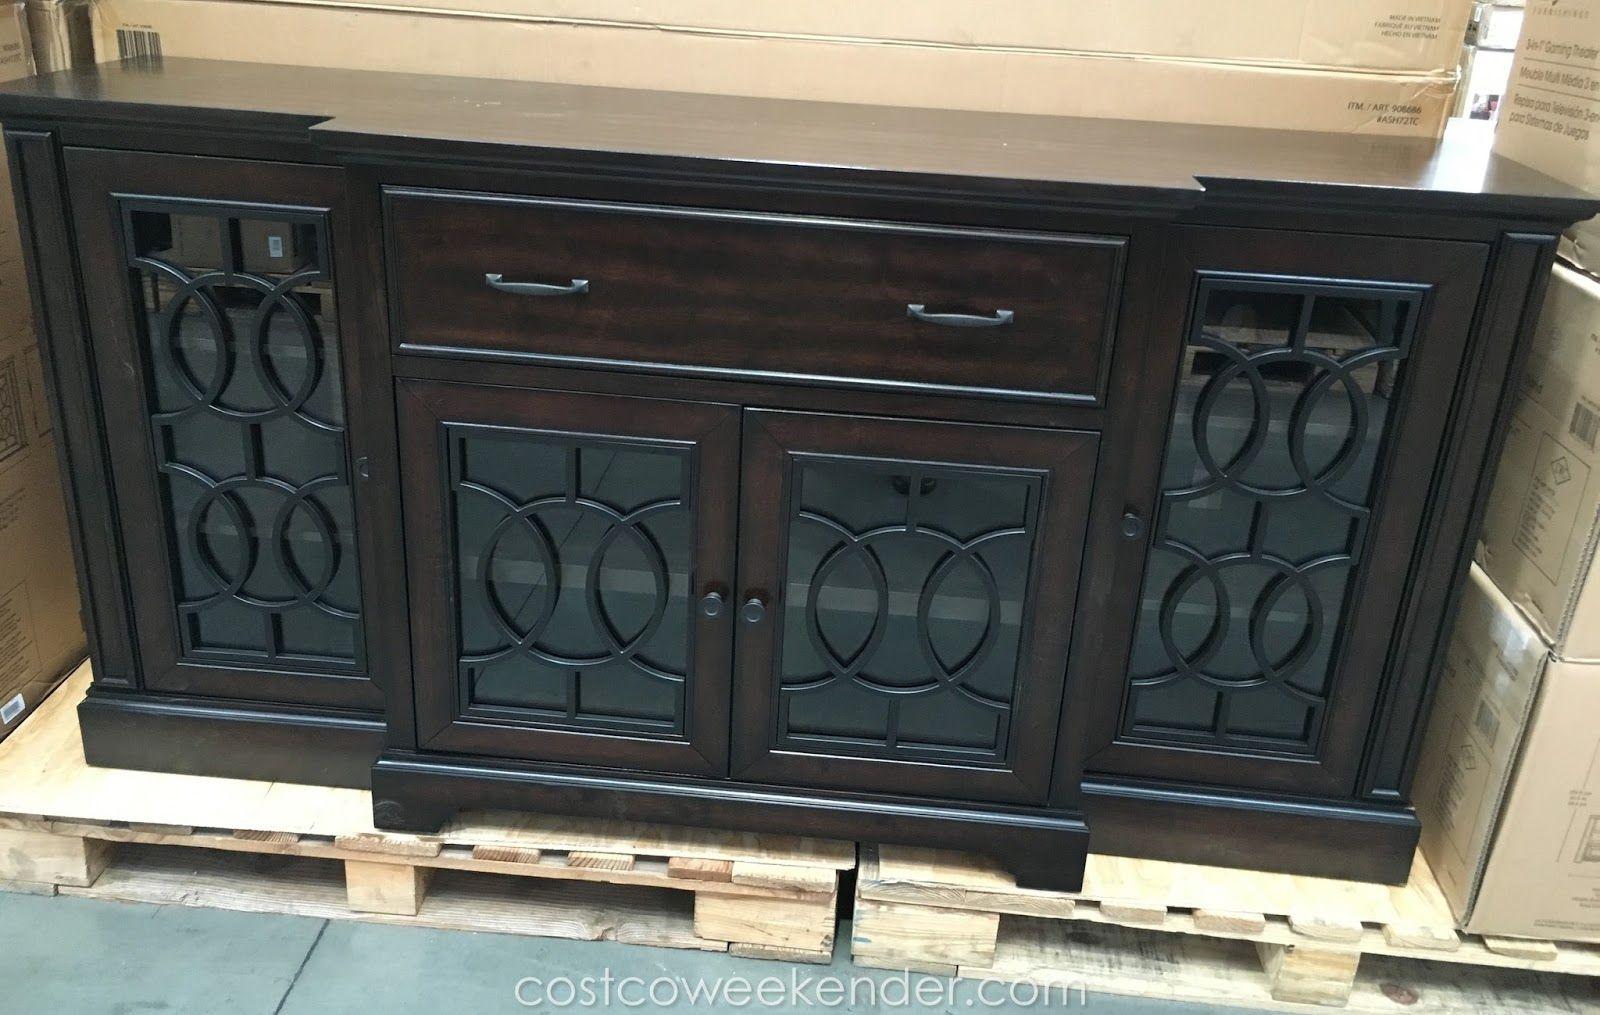 Bayside Furnishings Ashcroft Tv Console Tv Stand Furniture Bayside Furnishings 3 Piece Tv Stand